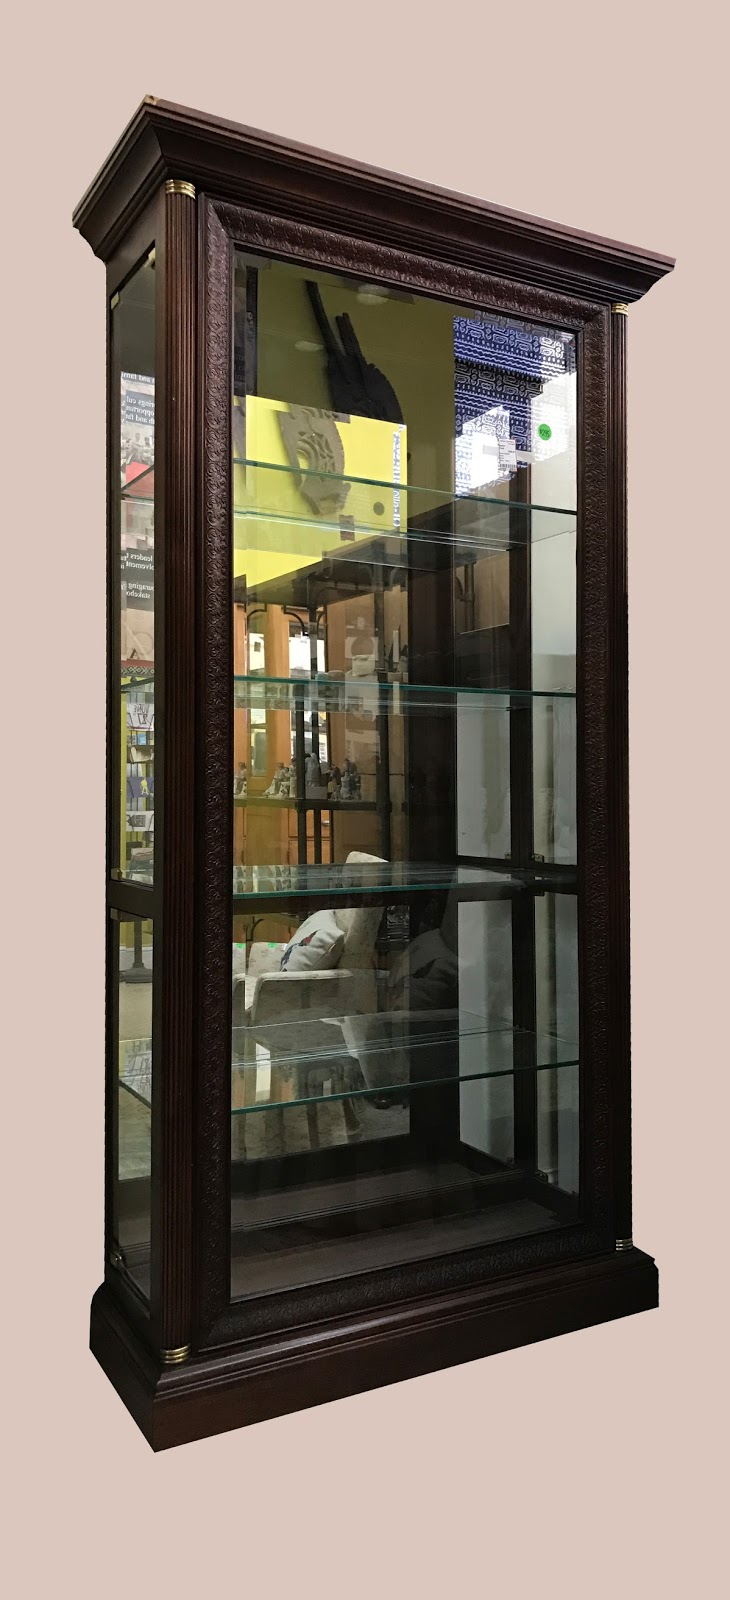 Uhuru Furniture & Collectibles: Large Lighted Curio ...